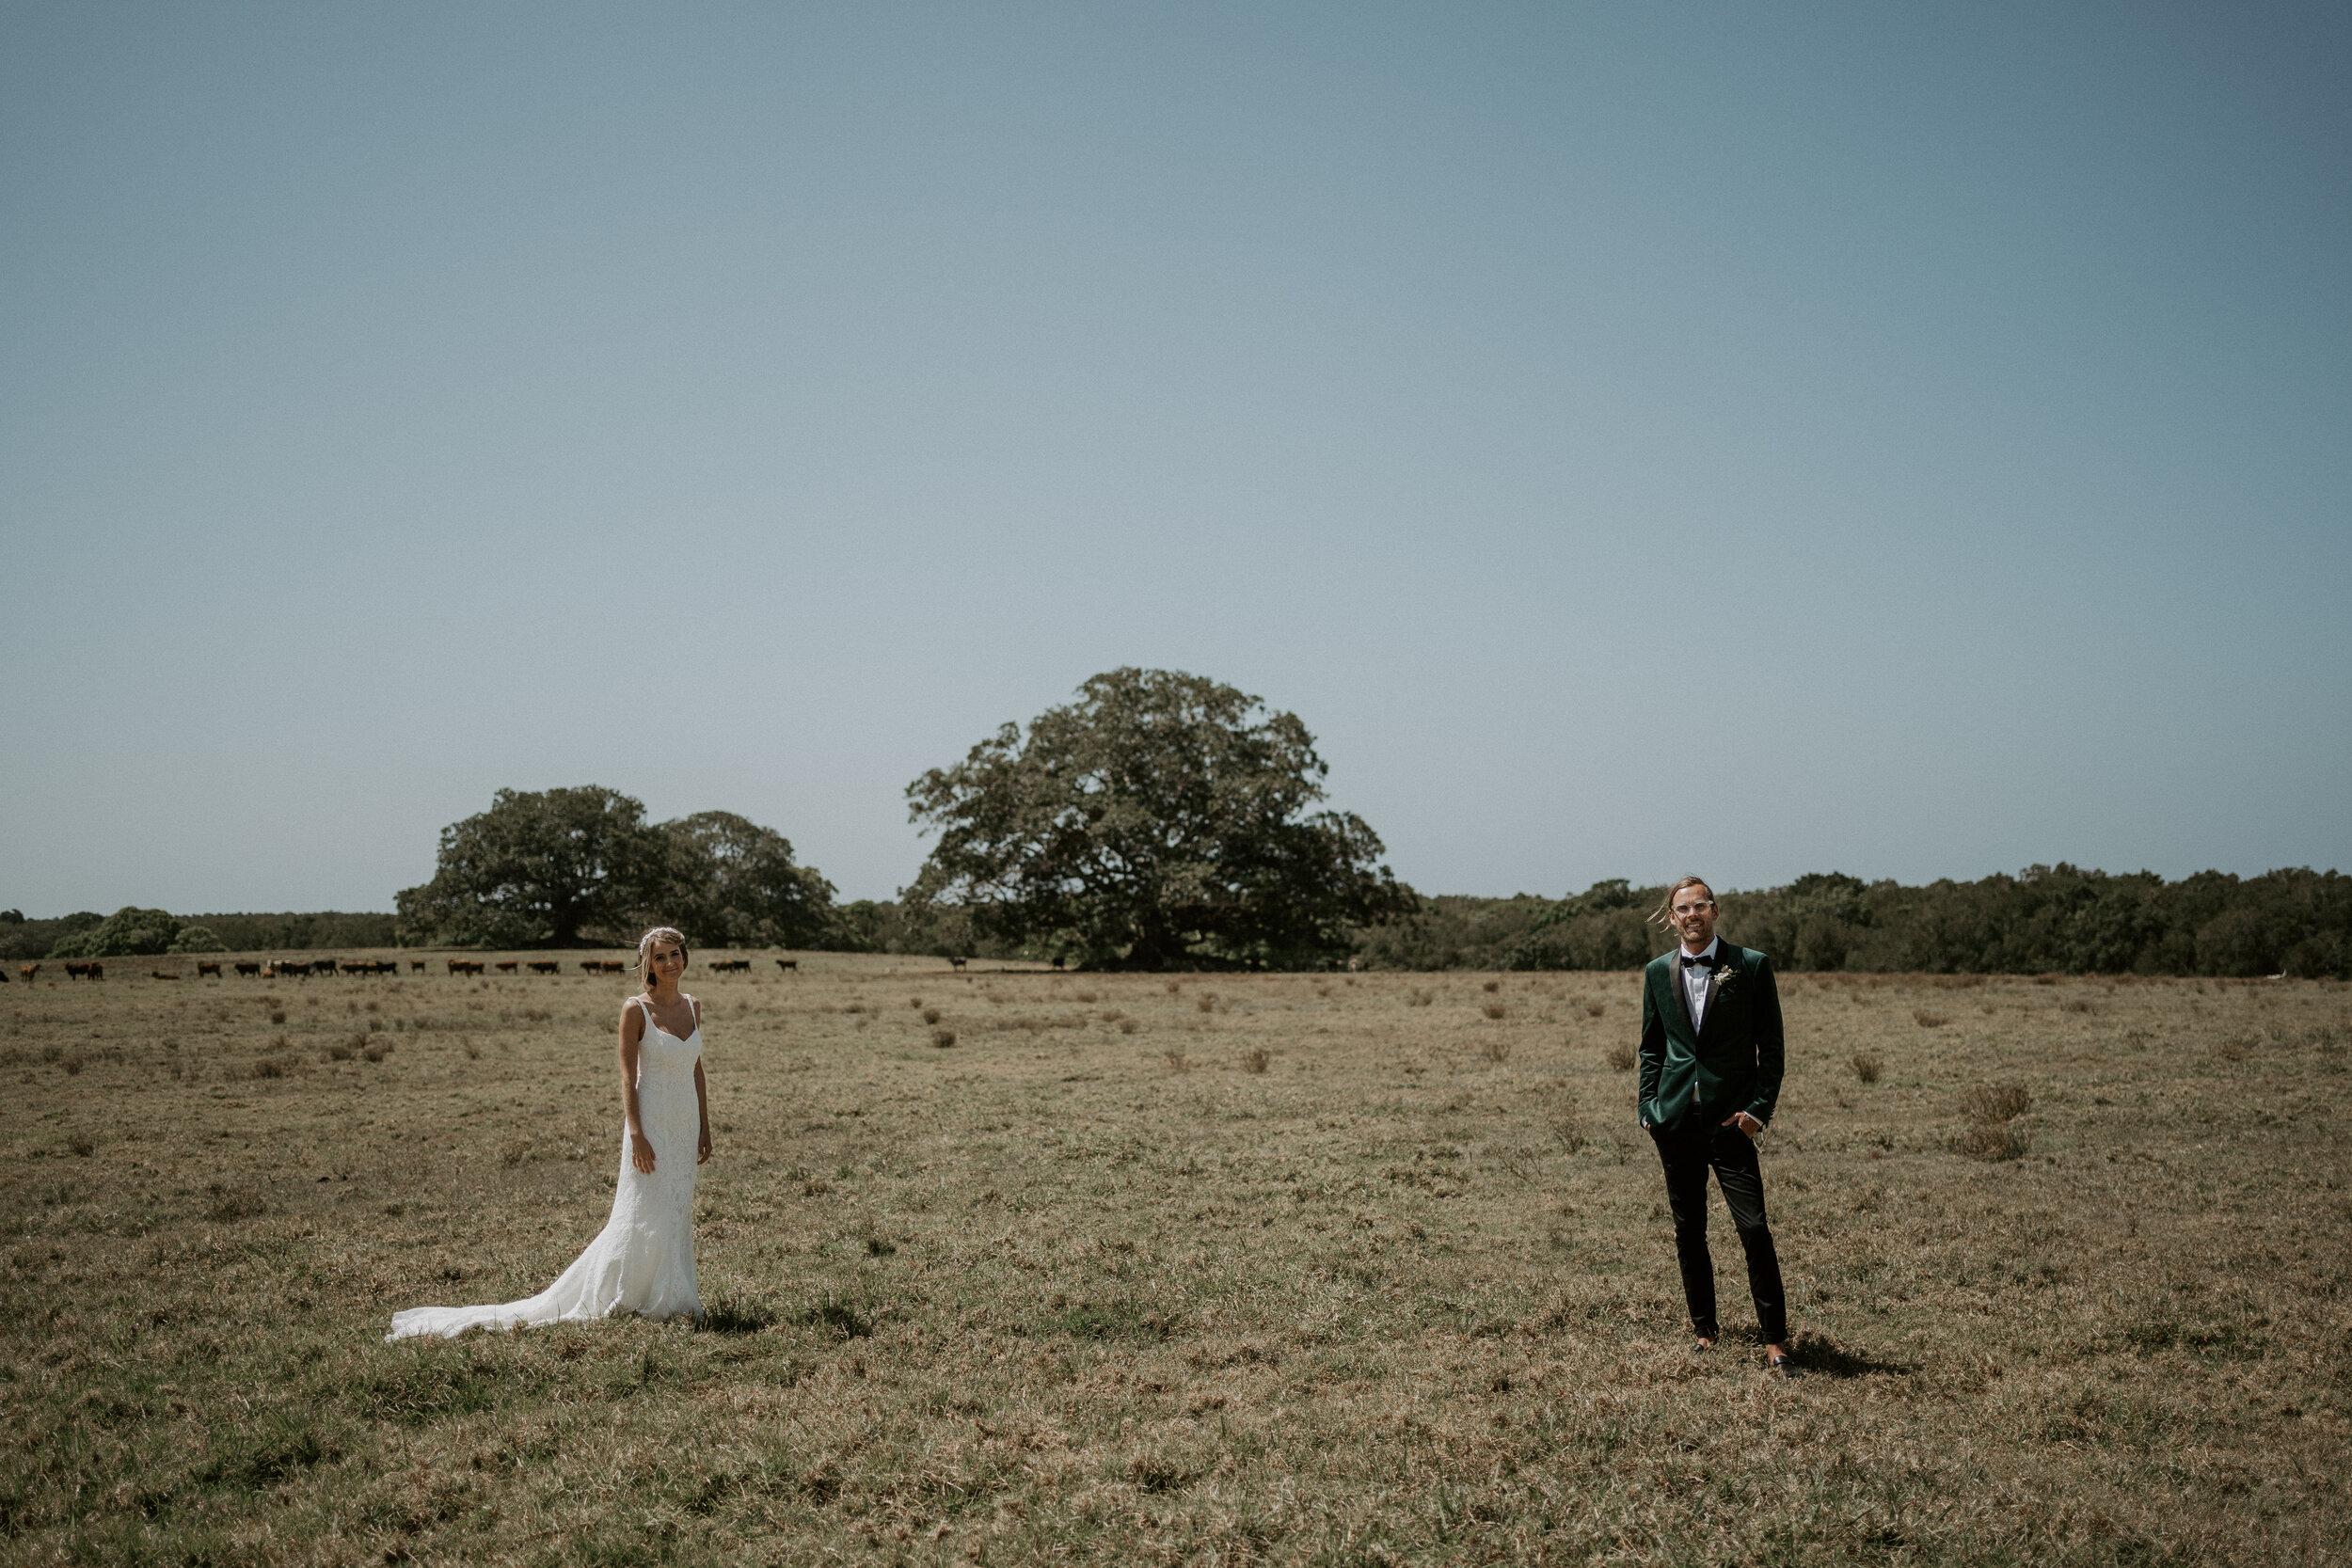 Figtree Byron Bay Wedding - Maia+James - Asher King - 61.jpg